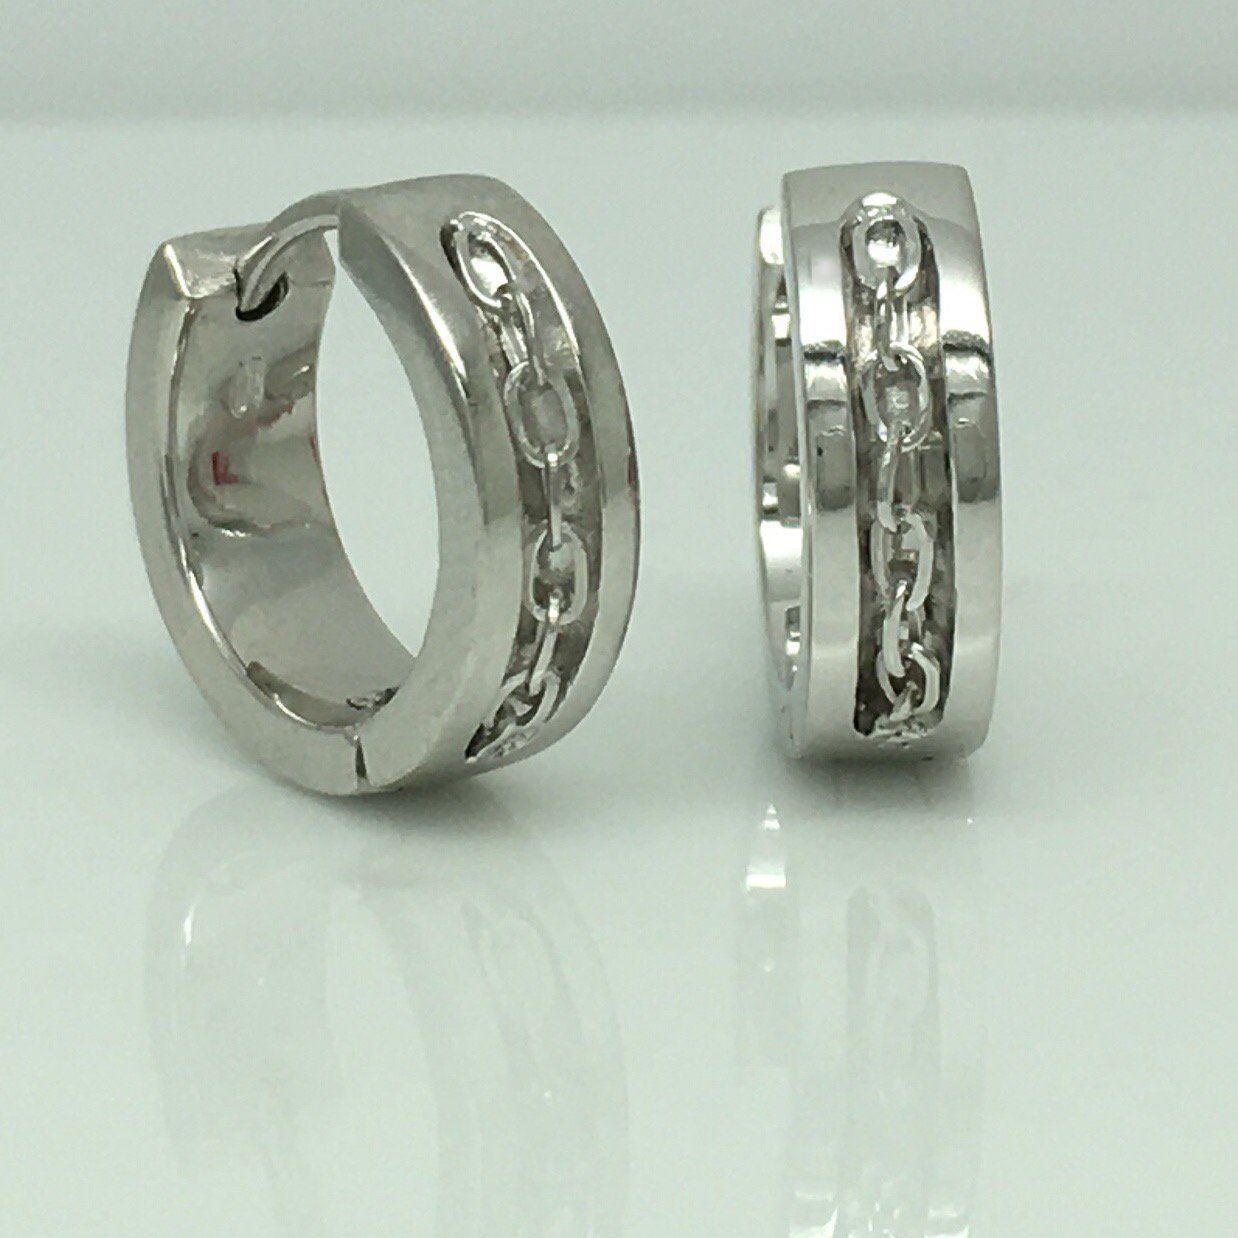 Men S Hoop Earrings Handmade From Sterling Silver Inset Chain Links E149sw